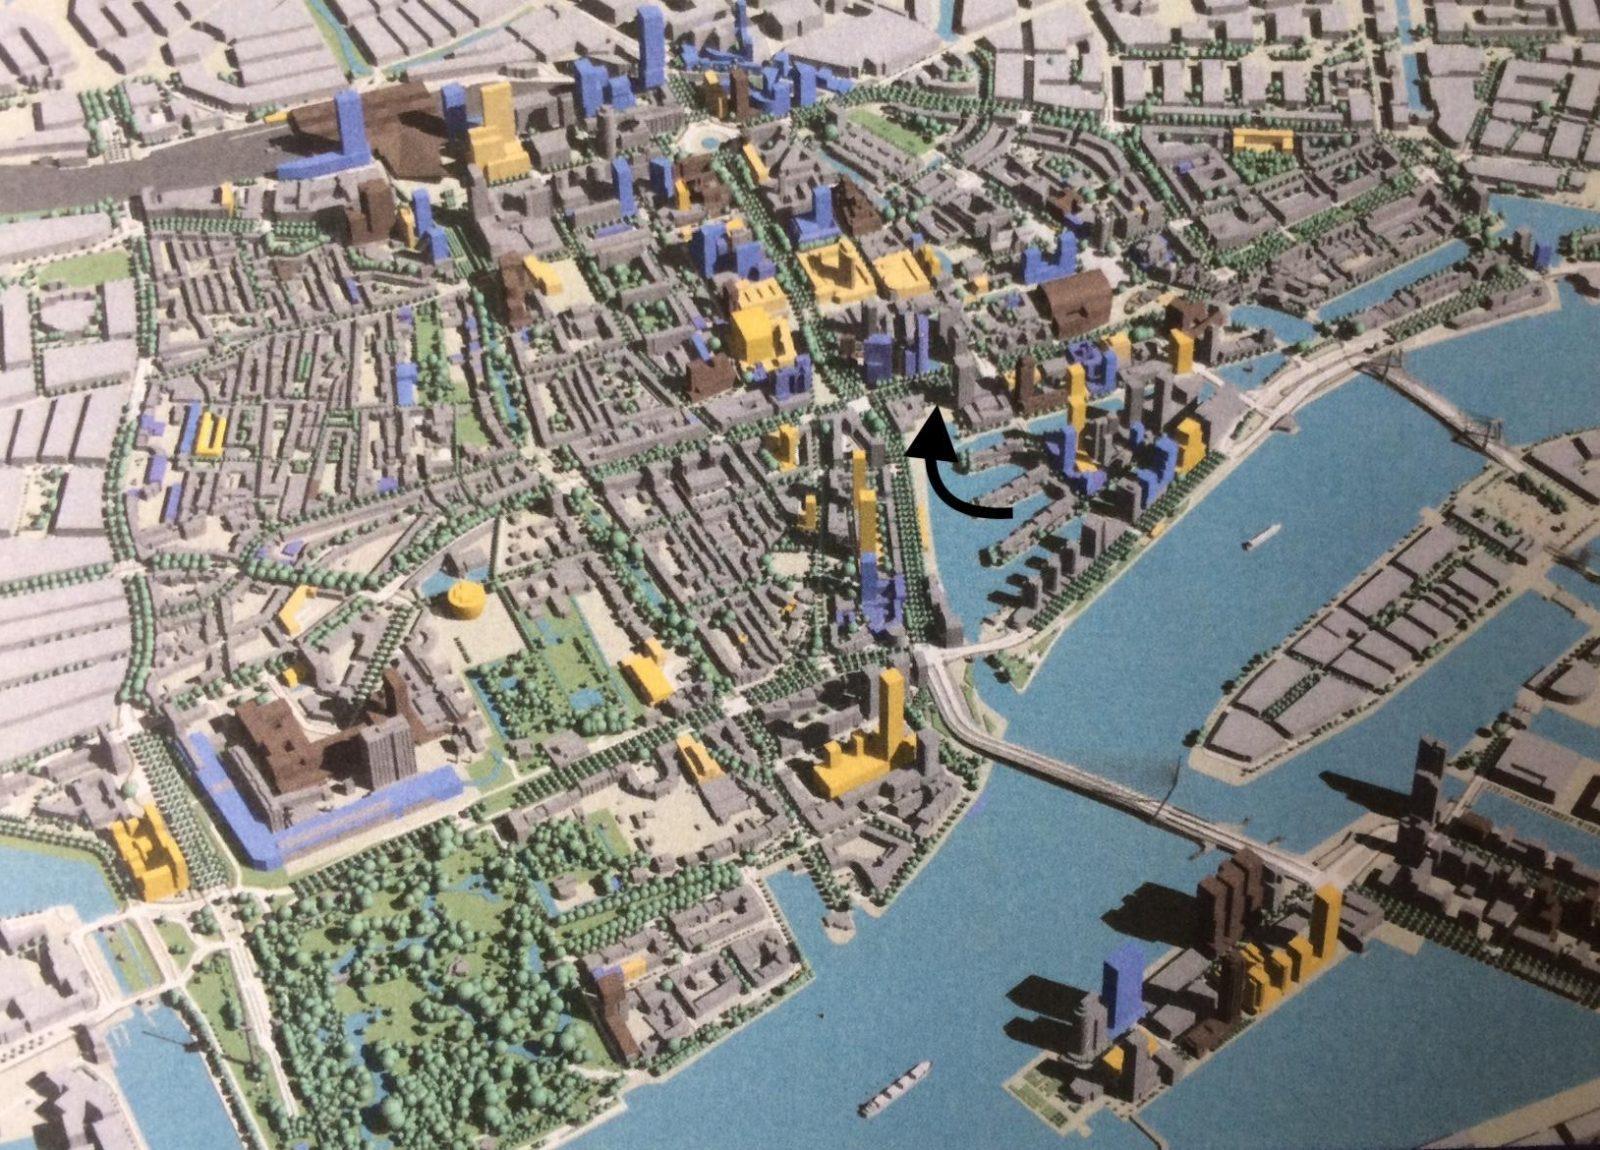 Jv Teeffelen Kaart Ruimte en Wonen Stadsontwikkeling 2017